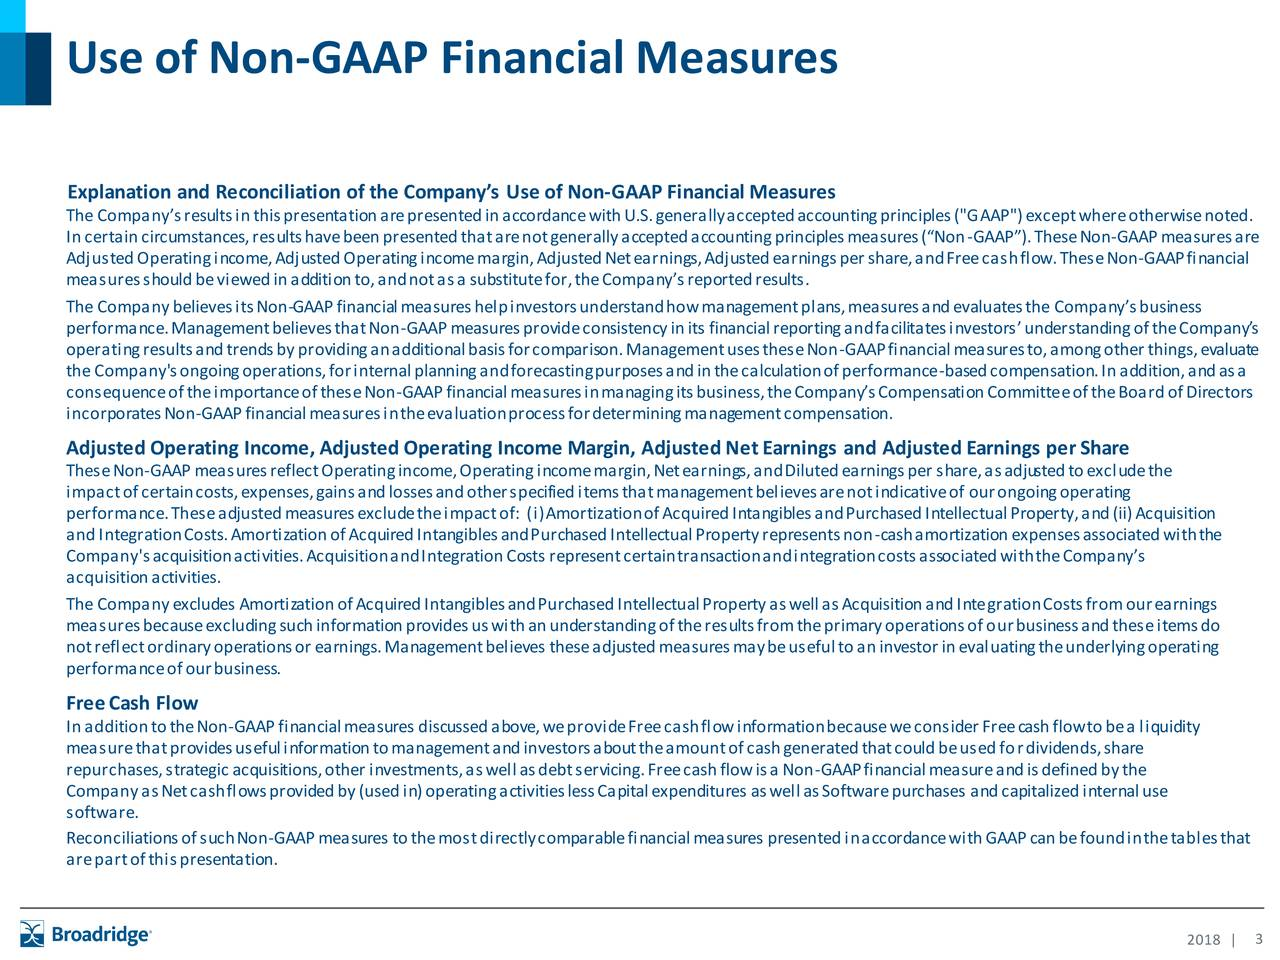 "Explanation and Reconciliation of the Company's Use of Non-GAAP Financial Measures TheCompany'sresultsinthispresentationarepresentedinaccordancewithU.S.generallyacceptedaccountingprinciples(""GAAP"")exceptwhereotherwisenoted. Incertaincircumstances,resultshavebeenpresentedthatarenotgenerallyacceptedaccountingprinciplesmeasures(""Non-GAAP"").TheseNon-GAAPmeasuresare AdjustedOperatingincome,AdjustedOperatingincomemargin,AdjustedNetearnings,Adjustedearningspershare,andFreecashflow.TheseNon-GAAPfinancial measuresshouldbeviewedinadditionto,andnotasa substitutefor,theCompany'sreportedresults. TheCompanybelievesitsNon-GAAPfinancialmeasureshelpinvestorsunderstandhowmanagementplans,measuresandevaluatesthe Company'sbusiness performance.ManagementbelievesthatNon-GAAPmeasuresprovideconsistencyinits financialreportingandfacilitatesinvestors'understandingoftheCompany's operatingresultsandtrendsbyprovidinganadditionalbasisforcomparison.ManagementusestheseNon-GAAPfinancialmeasuresto,amongotherthings,evaluate the Company'songoingoperations,forinternalplanningandforecastingpurposesandinthecalculationofperformance-basedcompensation.Inaddition,andasa consequenceoftheimportanceoftheseNon-GAAPfinancialmeasuresinmanagingitsbusiness,theCompany'sCompensationCommitteeoftheBoardofDirectors incorporatesNon-GAAPfinancialmeasuresintheevaluationprocessfordeterminingmanagementcompensation. AdjustedOperating Income, AdjustedOperating Income Margin, AdjustedNetEarnings and AdjustedEarnings perShare TheseNon-GAAPmeasuresreflectOperatingincome,Operatingincomemargin,Netearnings,andDilutedearningspershare,asadjustedtoexcludethe impactofcertaincosts,expenses,gainsandlossesandotherspecifieditemsthatmanagementbelievesarenotindicativeof ourongoingoperating performance.Theseadjustedmeasuresexcludetheimpactof: (i)AmortizationofAcquiredIntangiblesandPurchasedIntellectualProperty,and(ii)Acquisition andIntegrationCosts.AmortizationofAcquiredIntangiblesandPurchasedIntellectualPropertyrepresentsnon-cashamortizationexp"